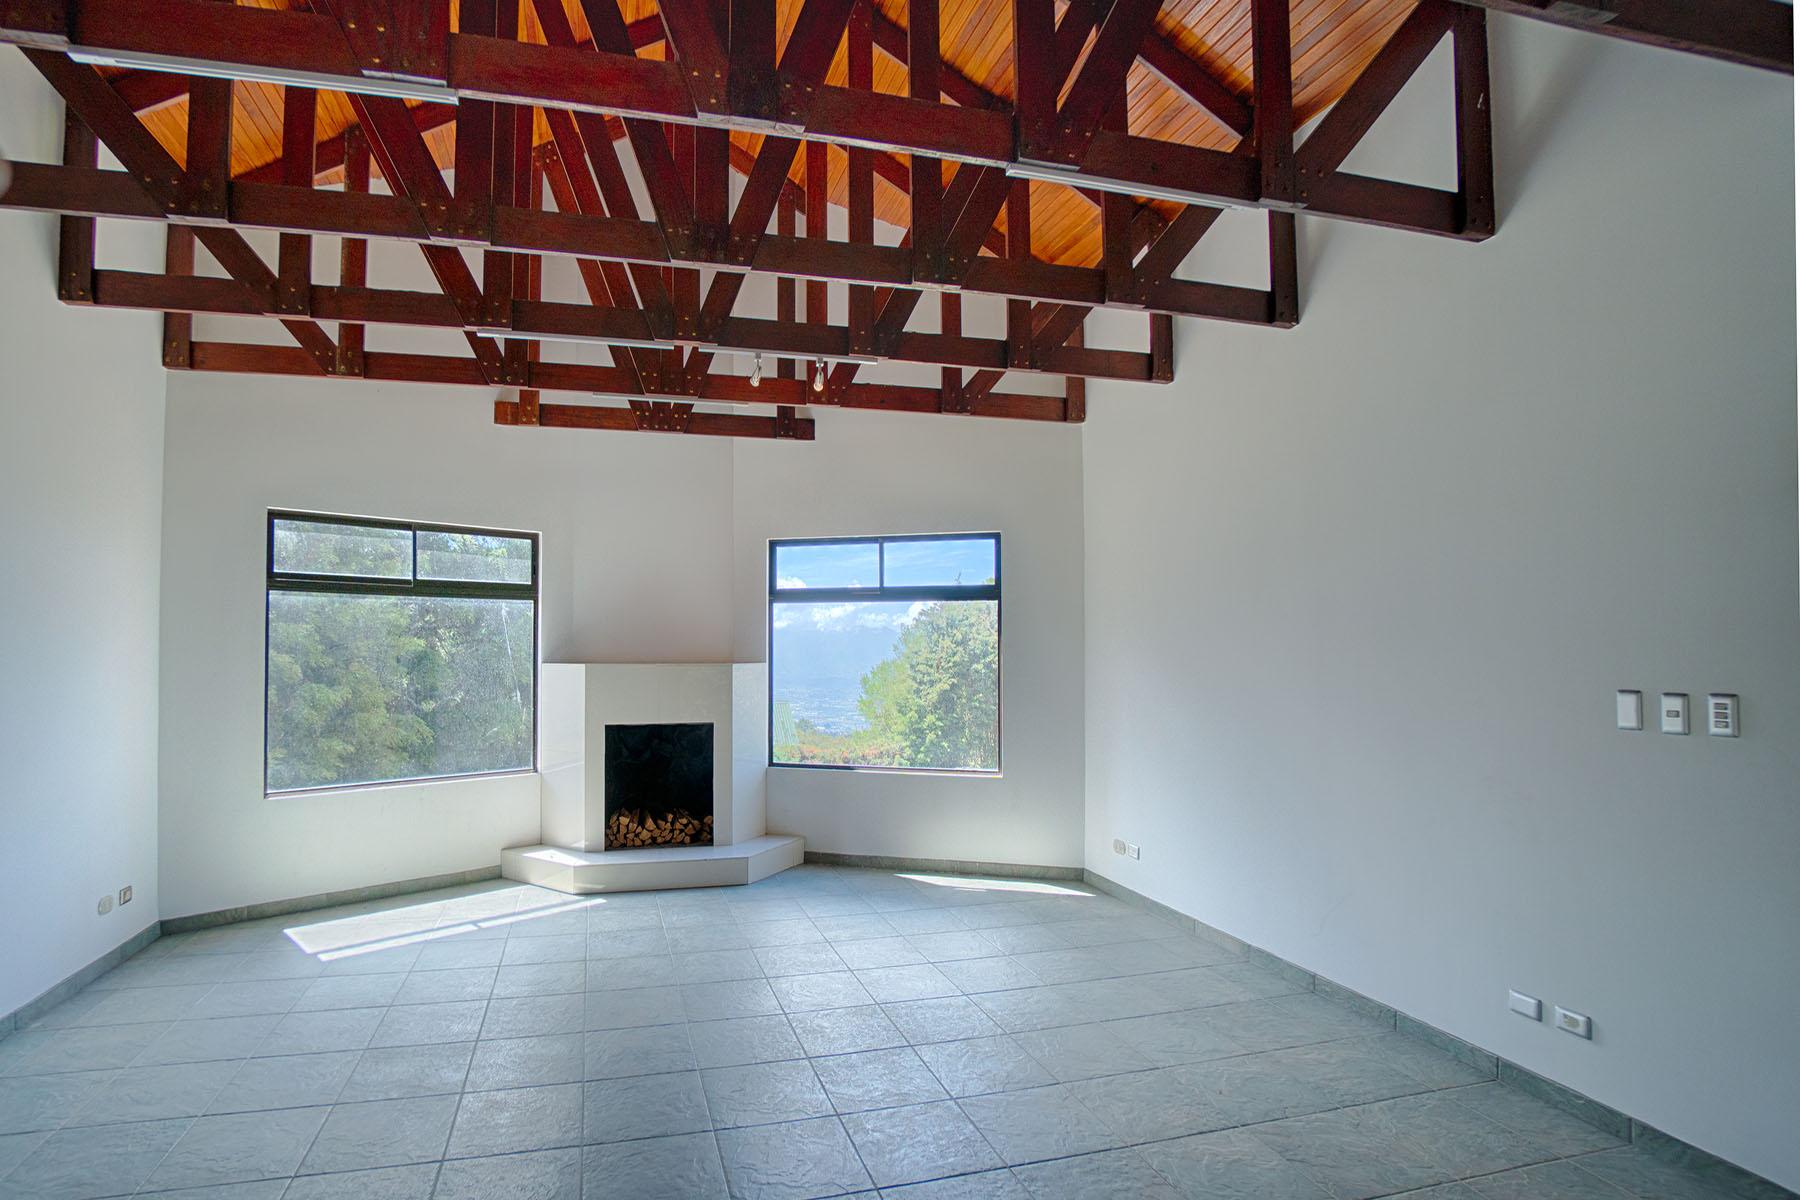 Additional photo for property listing at Ecuestre Despertar San Rafael, Heredia Costa Rica